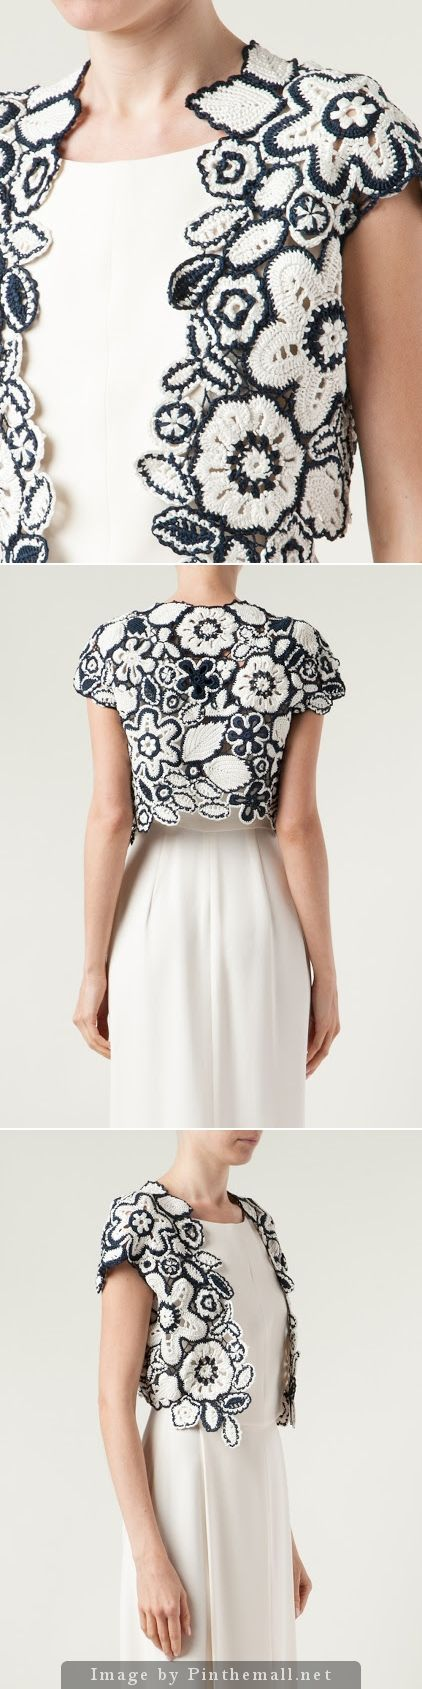 crochet - bolero - irish lace in black and white - oscar de la renta - bit gorgeous